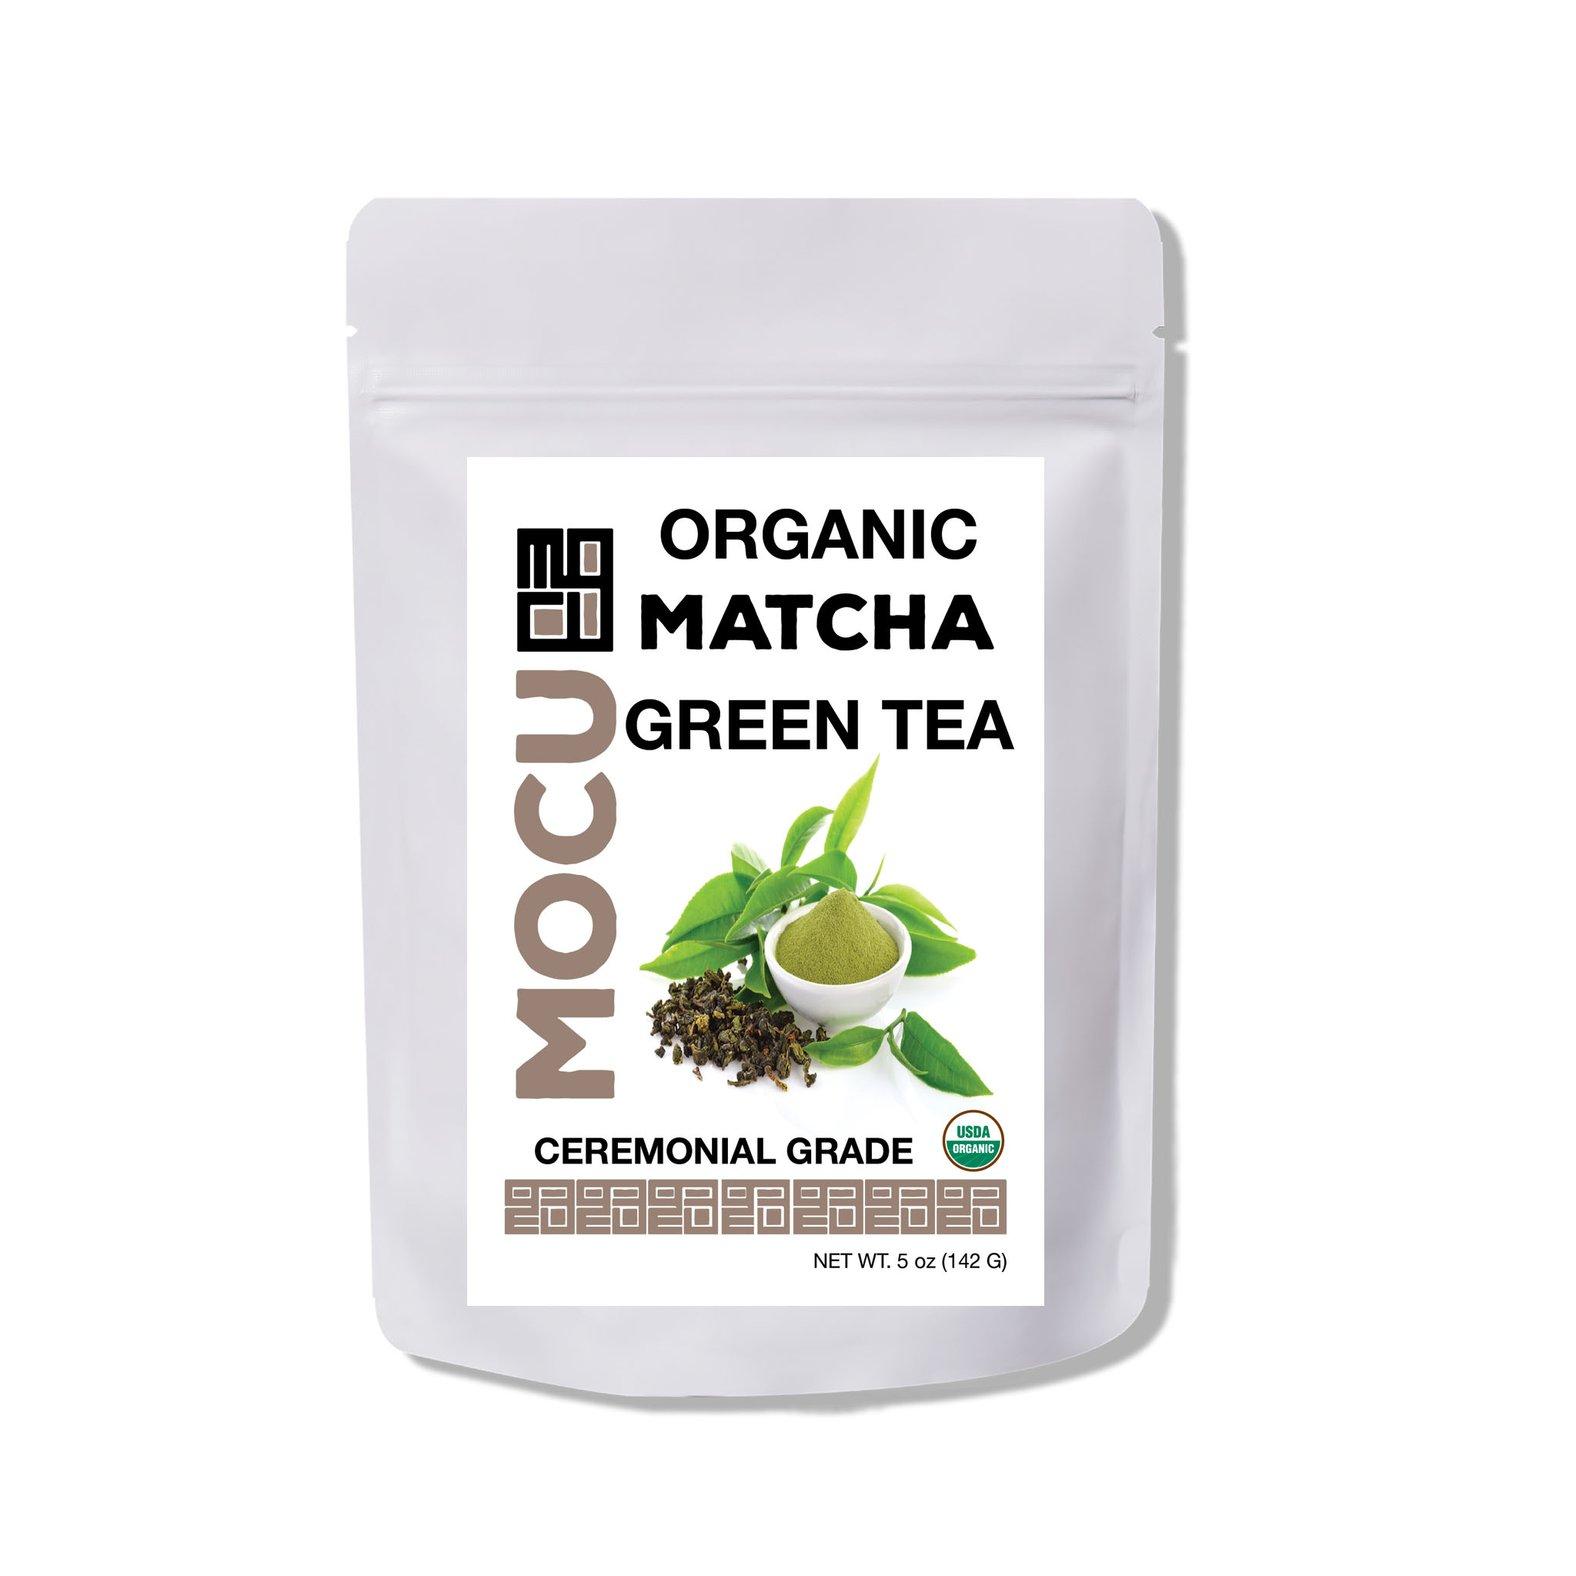 mocu-organic-matcha-green-tea-front.jpg